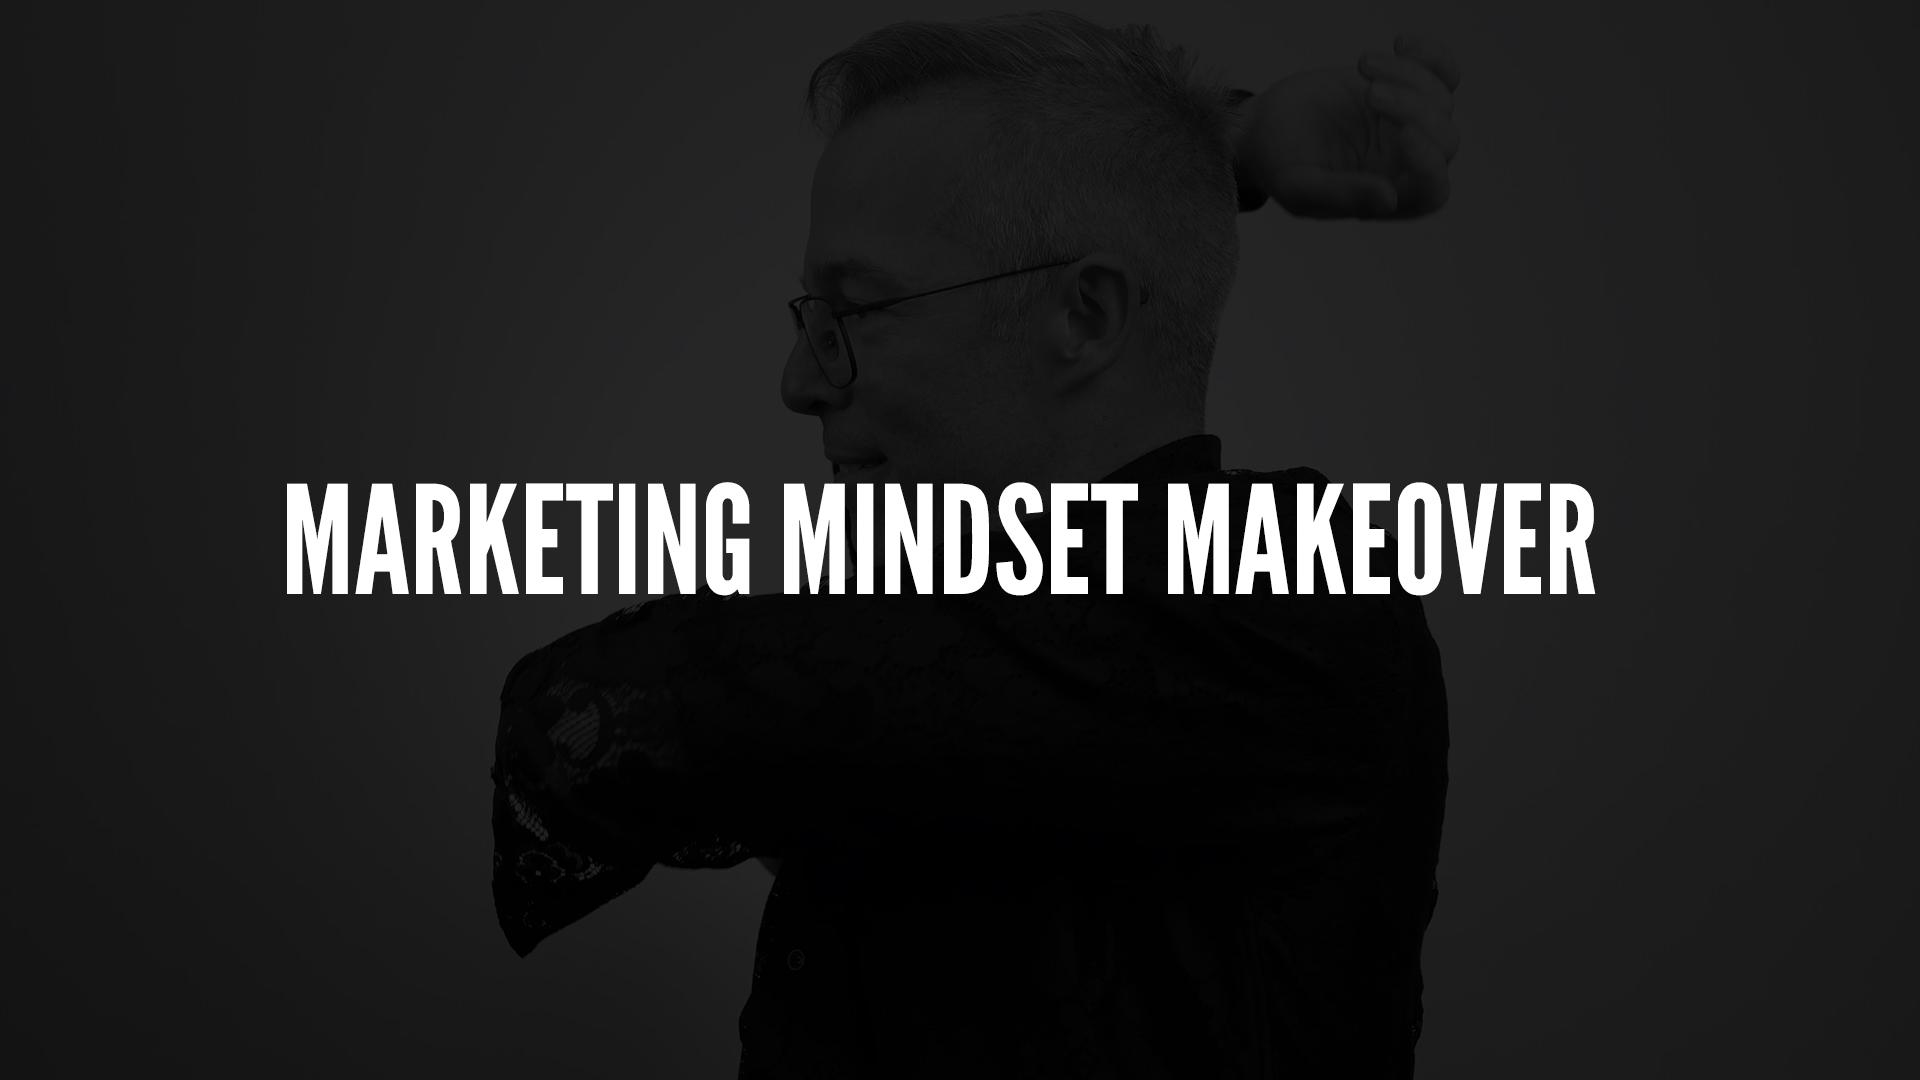 Marketing Mindset Makeover.jpg